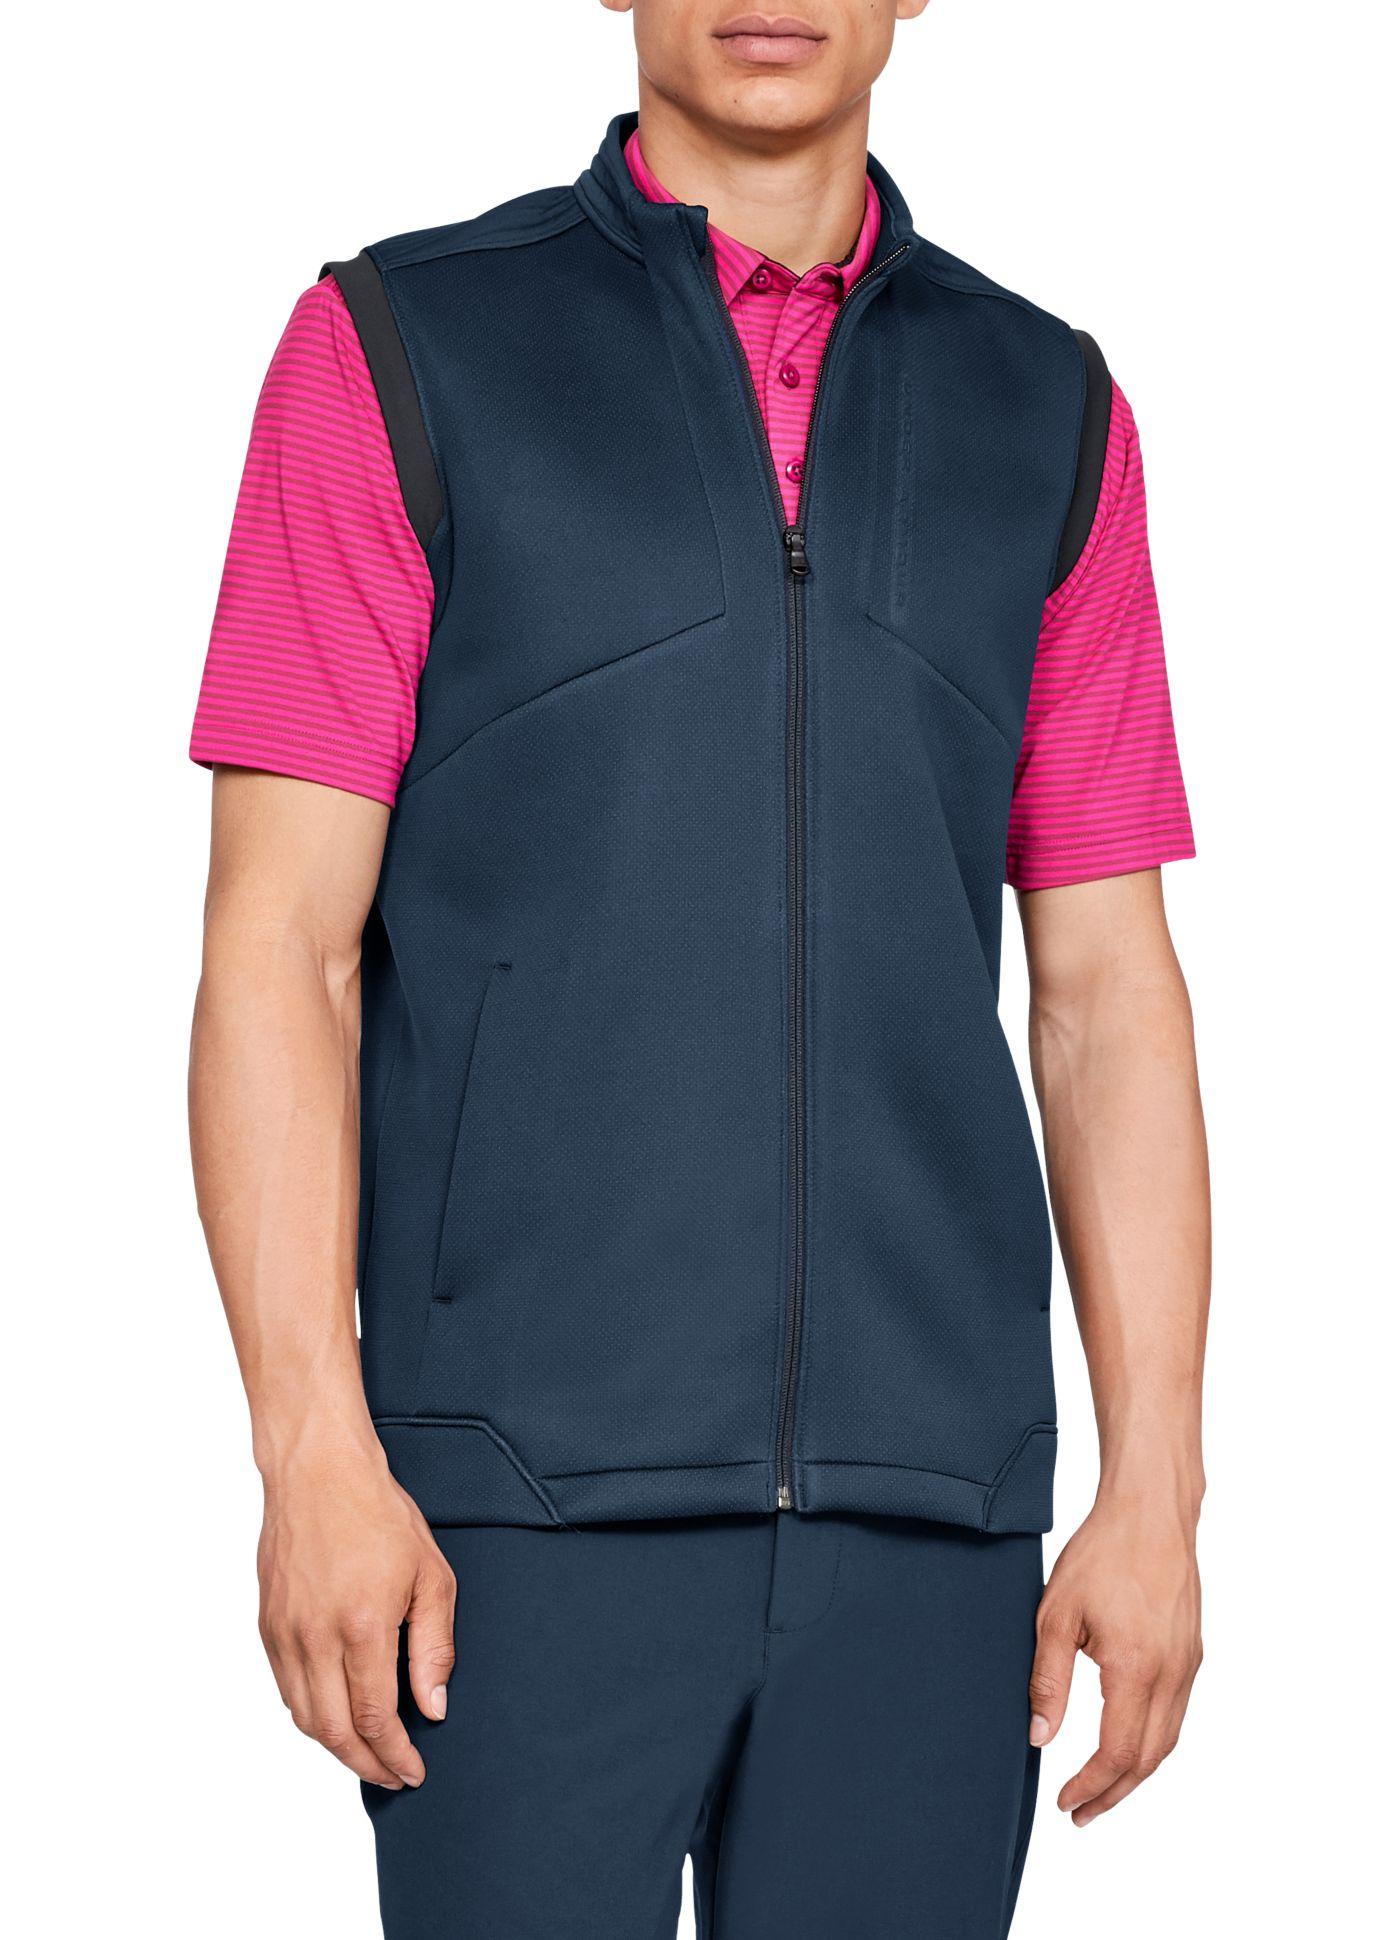 Under Armour Men's Storm Daytona Golf Vest